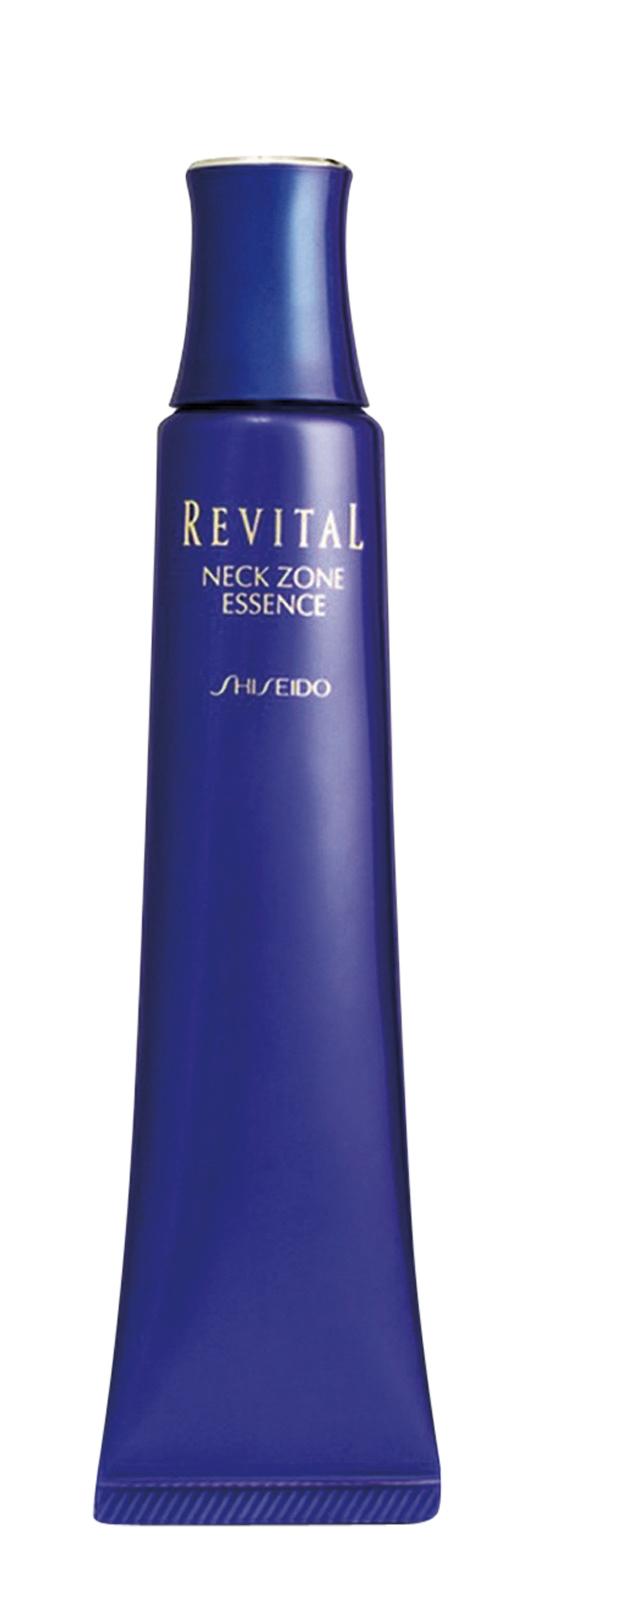 Tinh chất tái sinh vùng cổ Shiseido Revital Neck Zone Essense